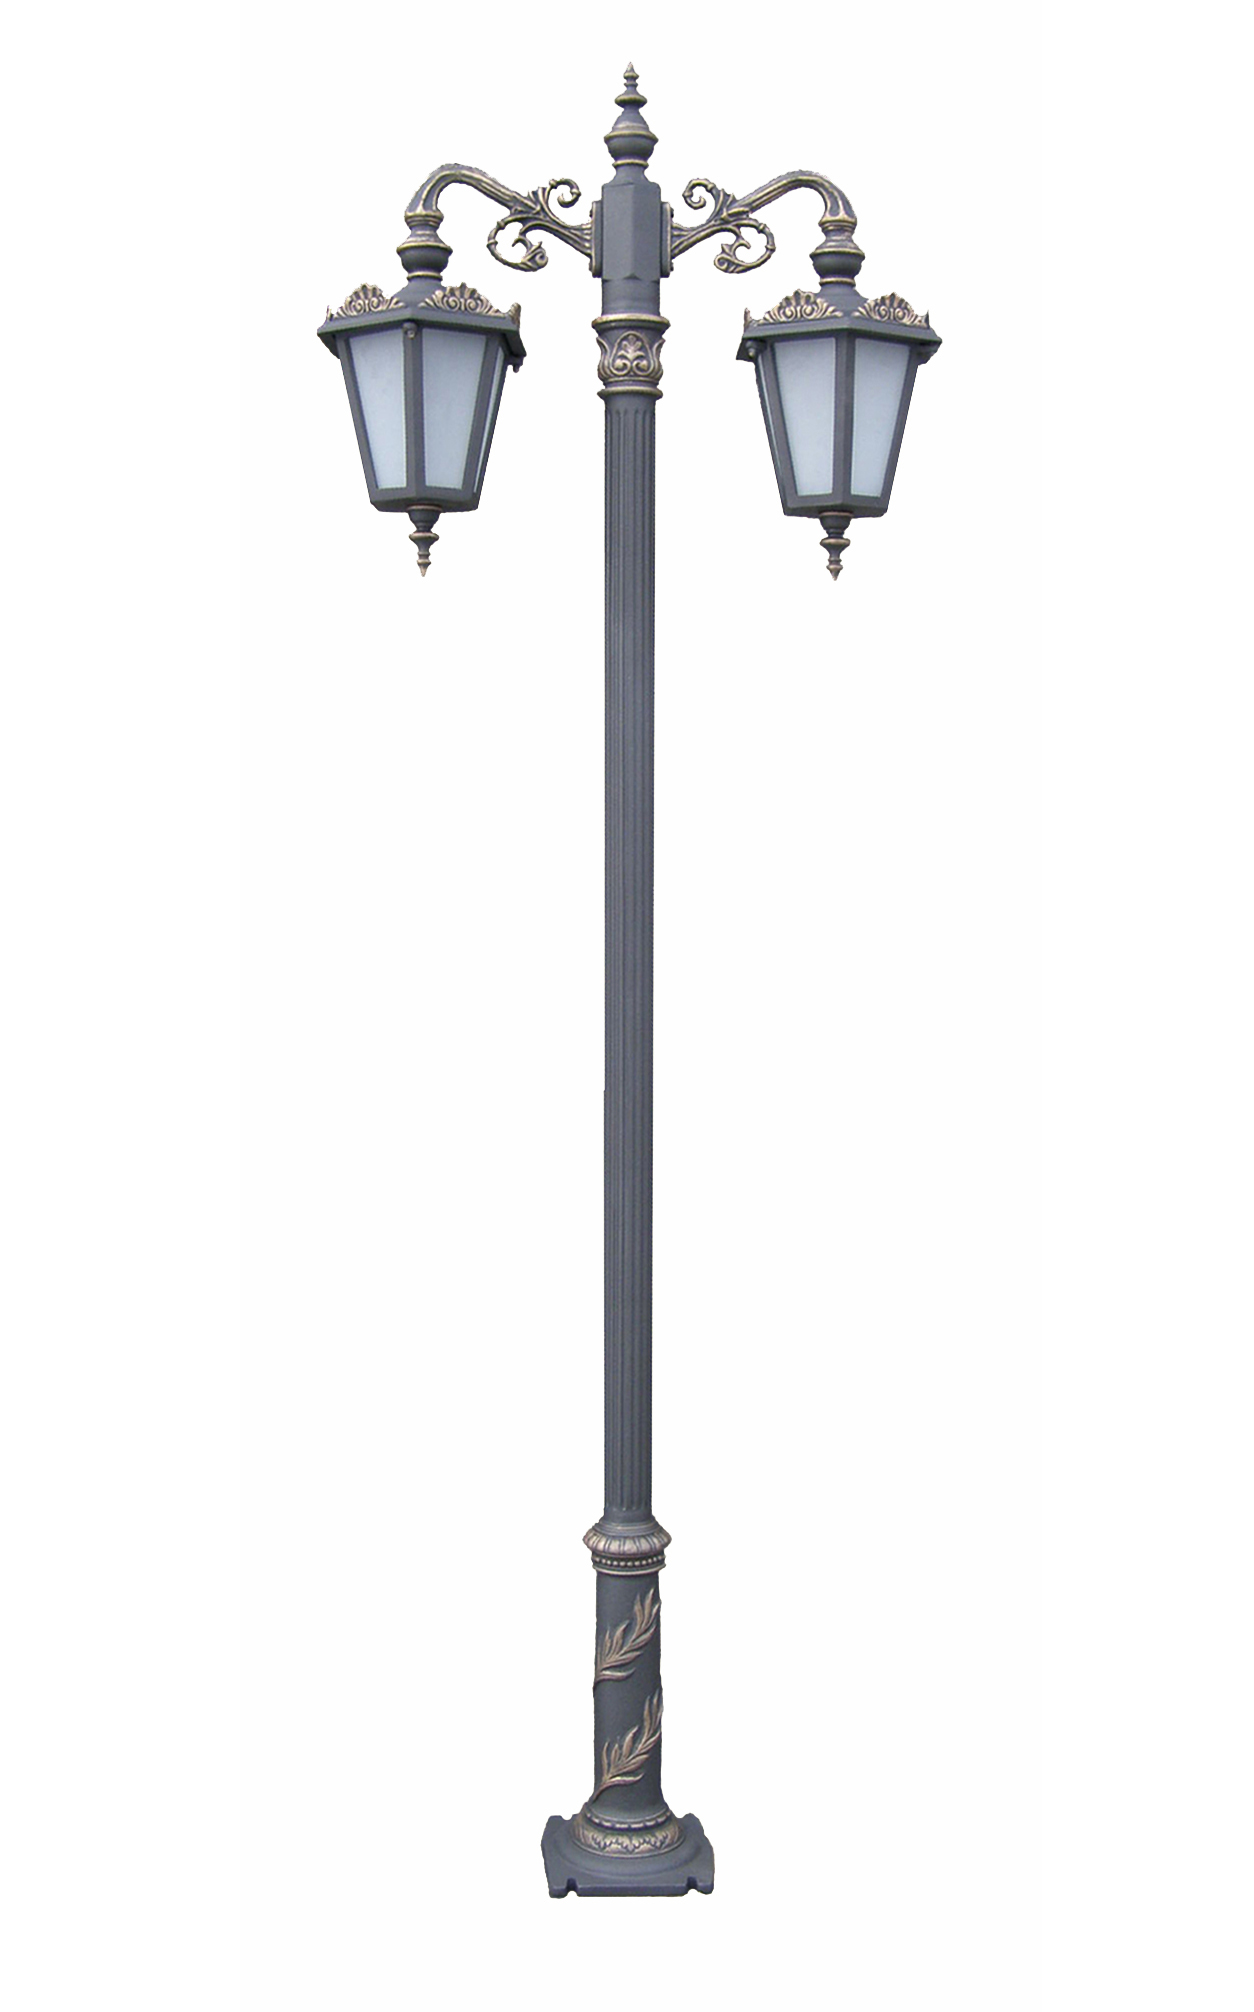 Stalpi ornamentali pentru iluminat stradal, parcuri, gradini BRAMAL LIGHT - Poza 32